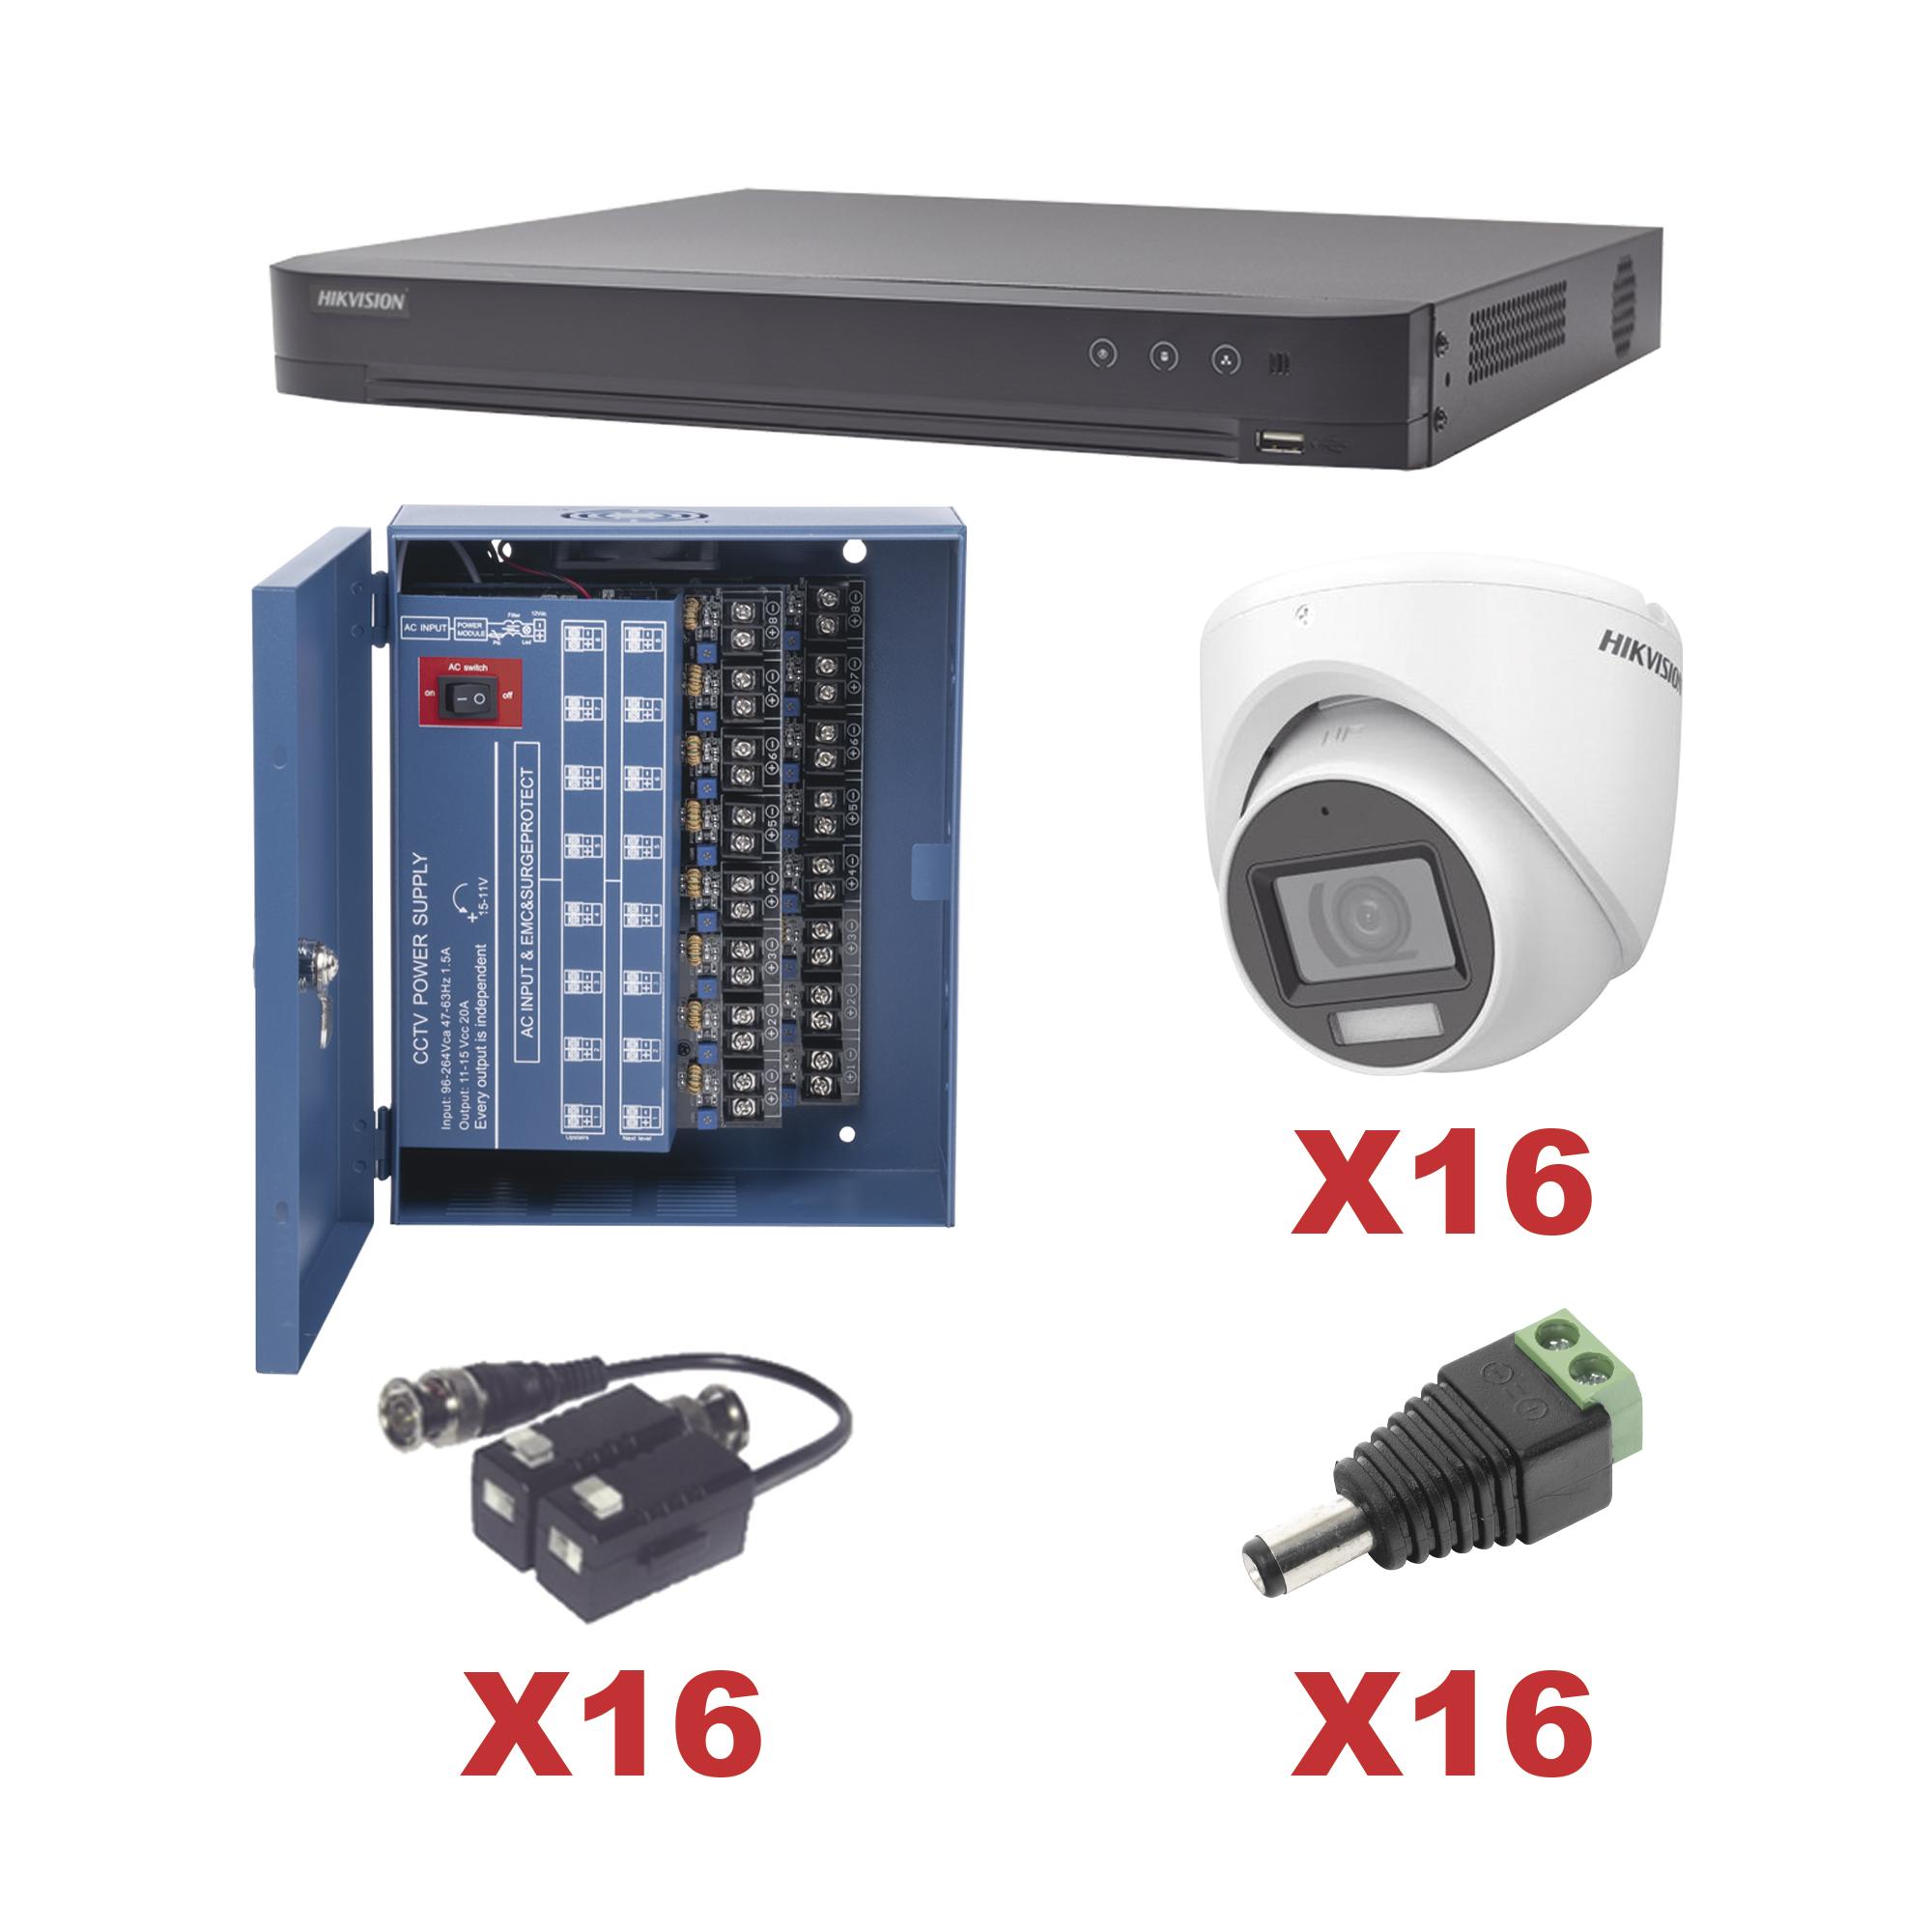 KIT TurboHD 1080p / DVR 16 Canales / 16 Cámaras turret (exterior 2.8 mm) / Transceptores / Conectores / Fuente de Poder Profesional